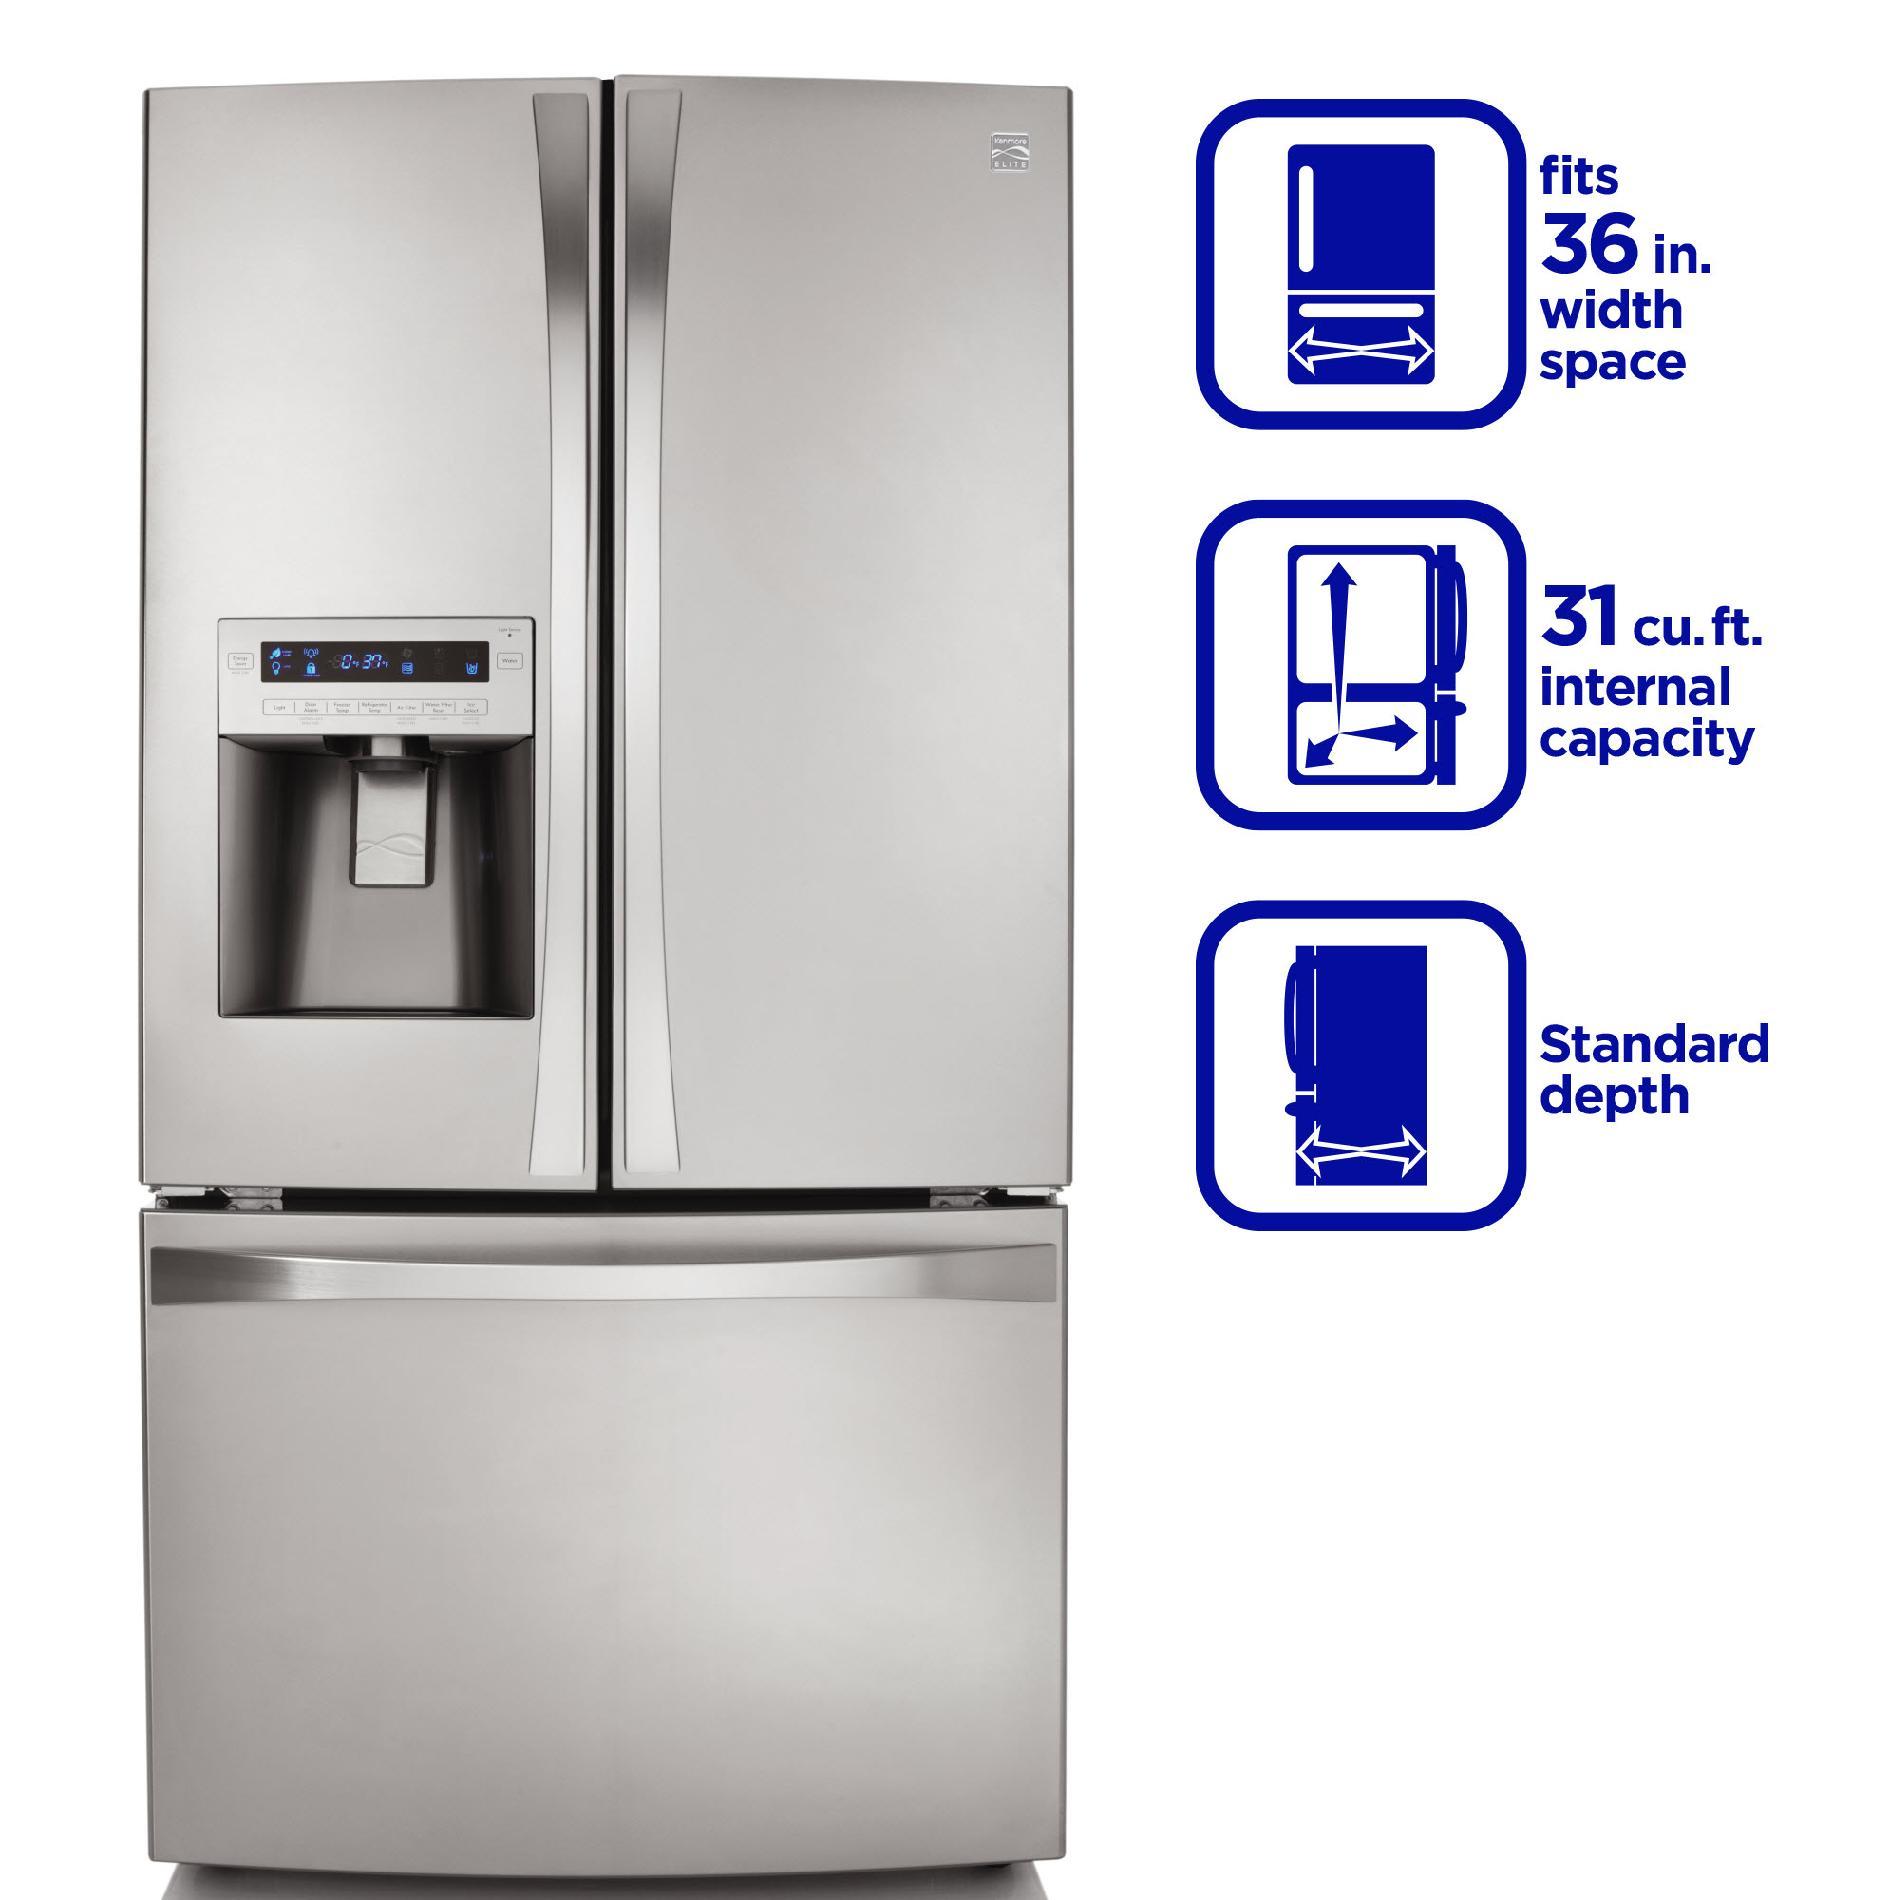 Kenmore Elite French Door Refrigerator Water Filter Photos Wall